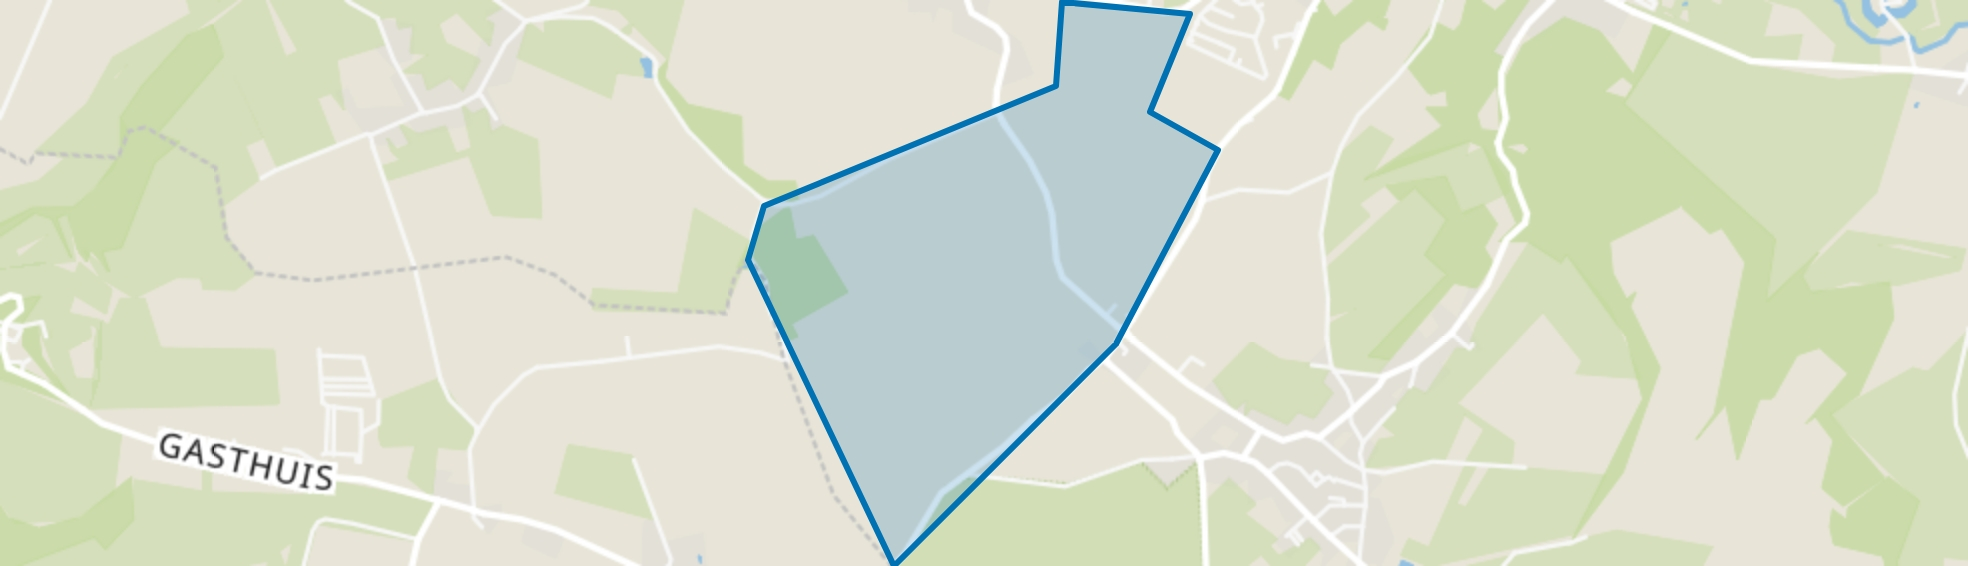 Vilterveld, Valkenburg (LI) map